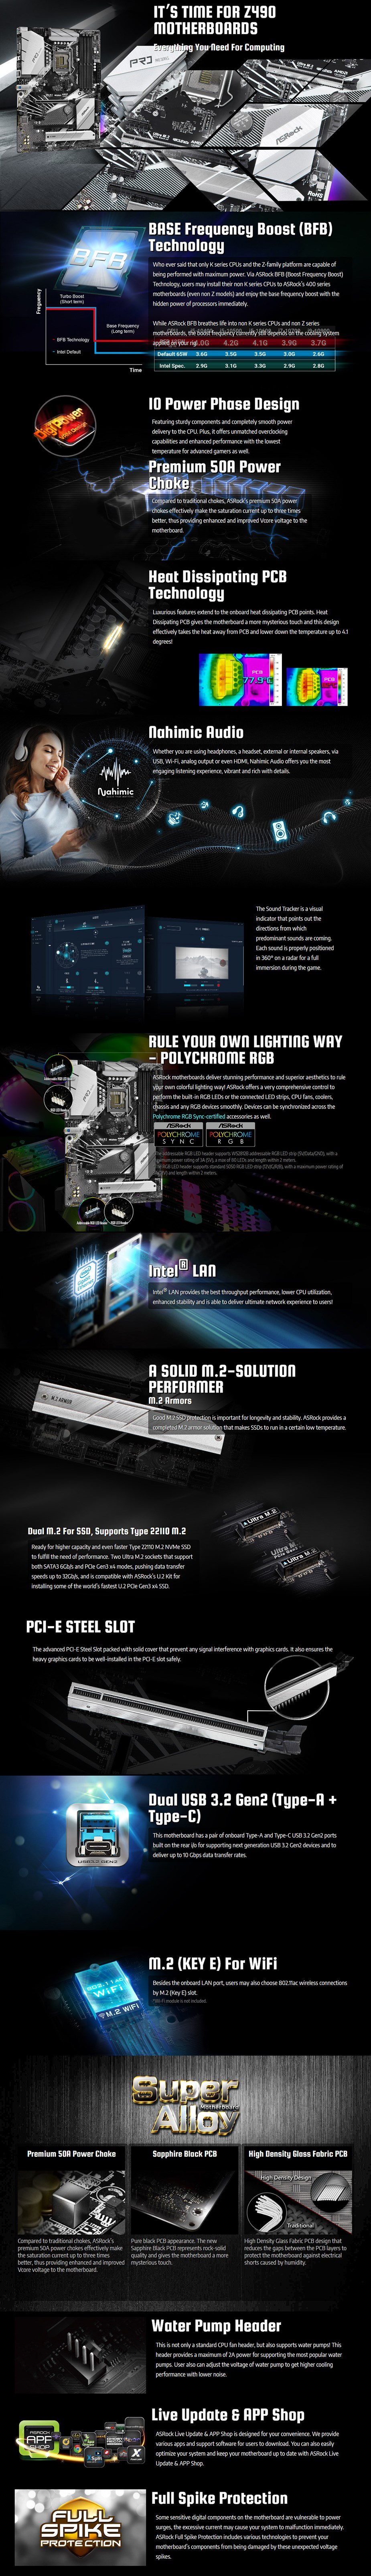 asrock-z490-pro4-lga-1200-atx-motherboard-ac34585-9.jpg